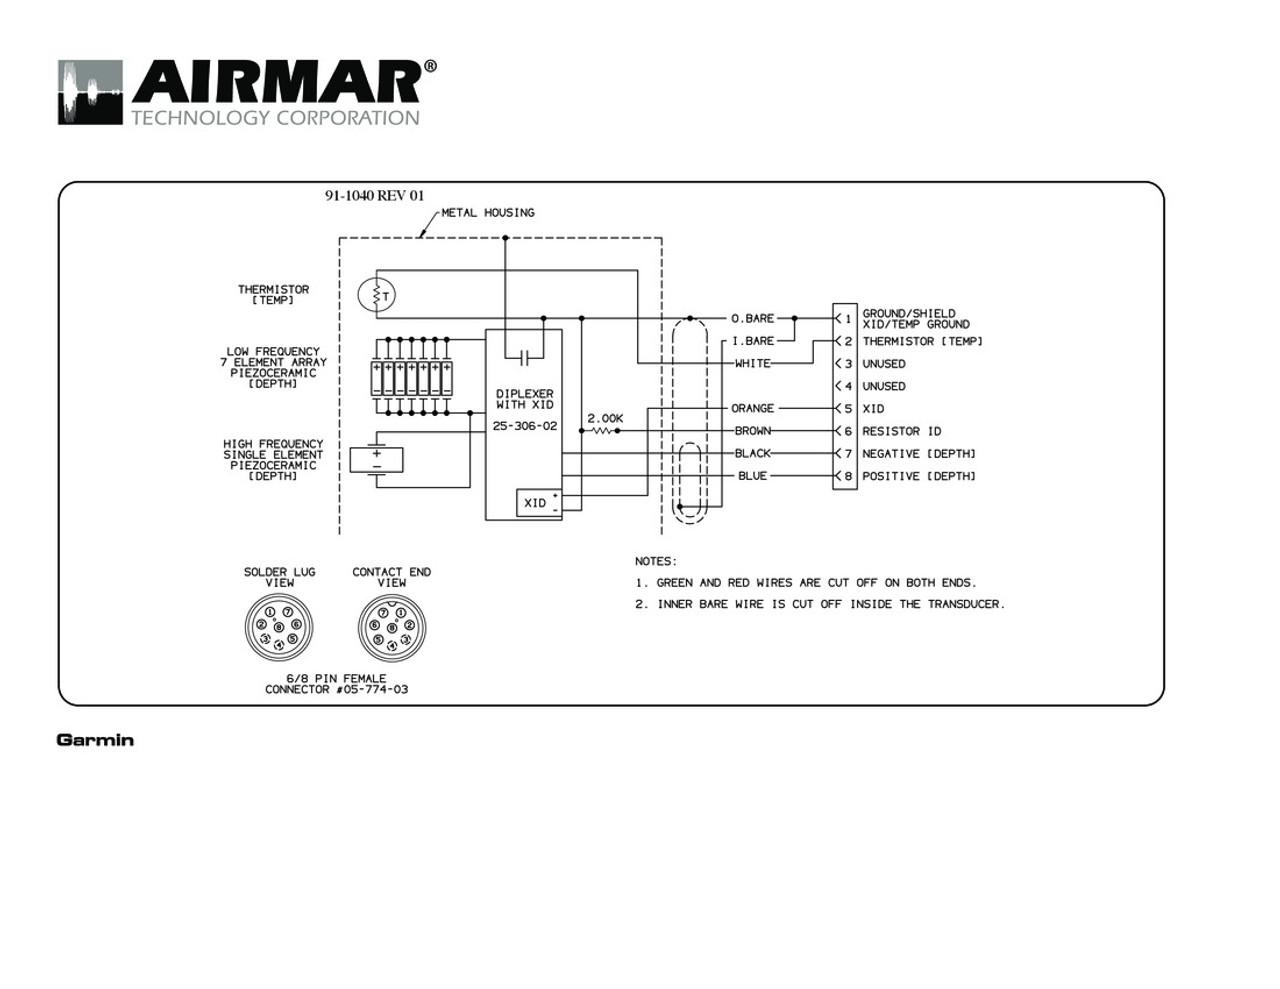 airmar wiring diagram garmin 1kw 8 pin d t blue bottle marinedepth  [ 1100 x 850 Pixel ]